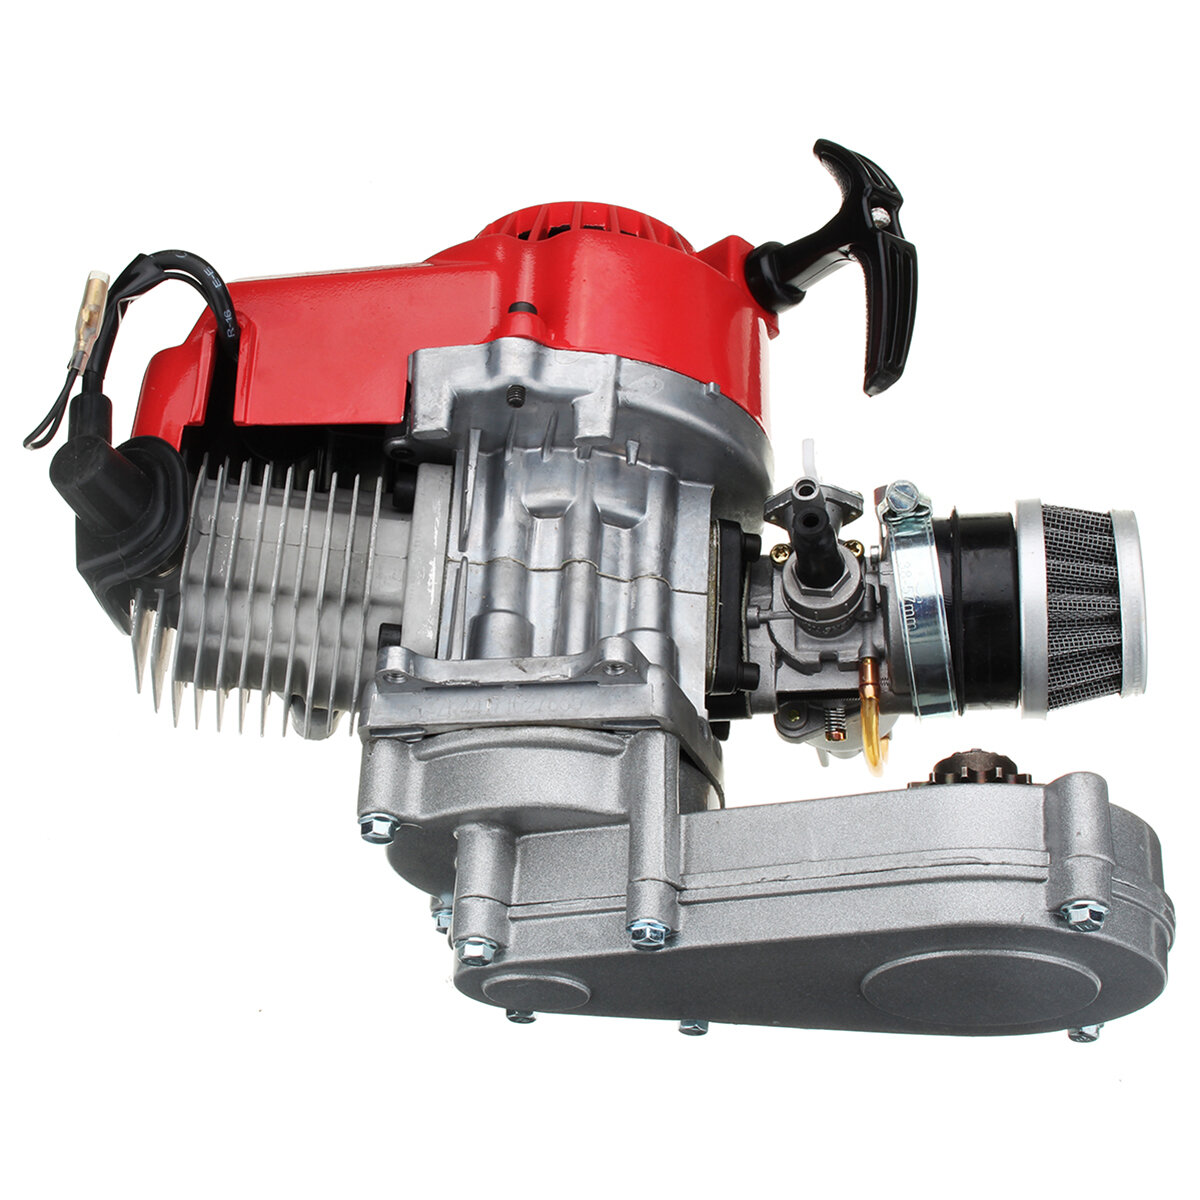 49cc Engine 2-Stroke Pull Start with Transmission For Mini Moto Dirt Bike  Red